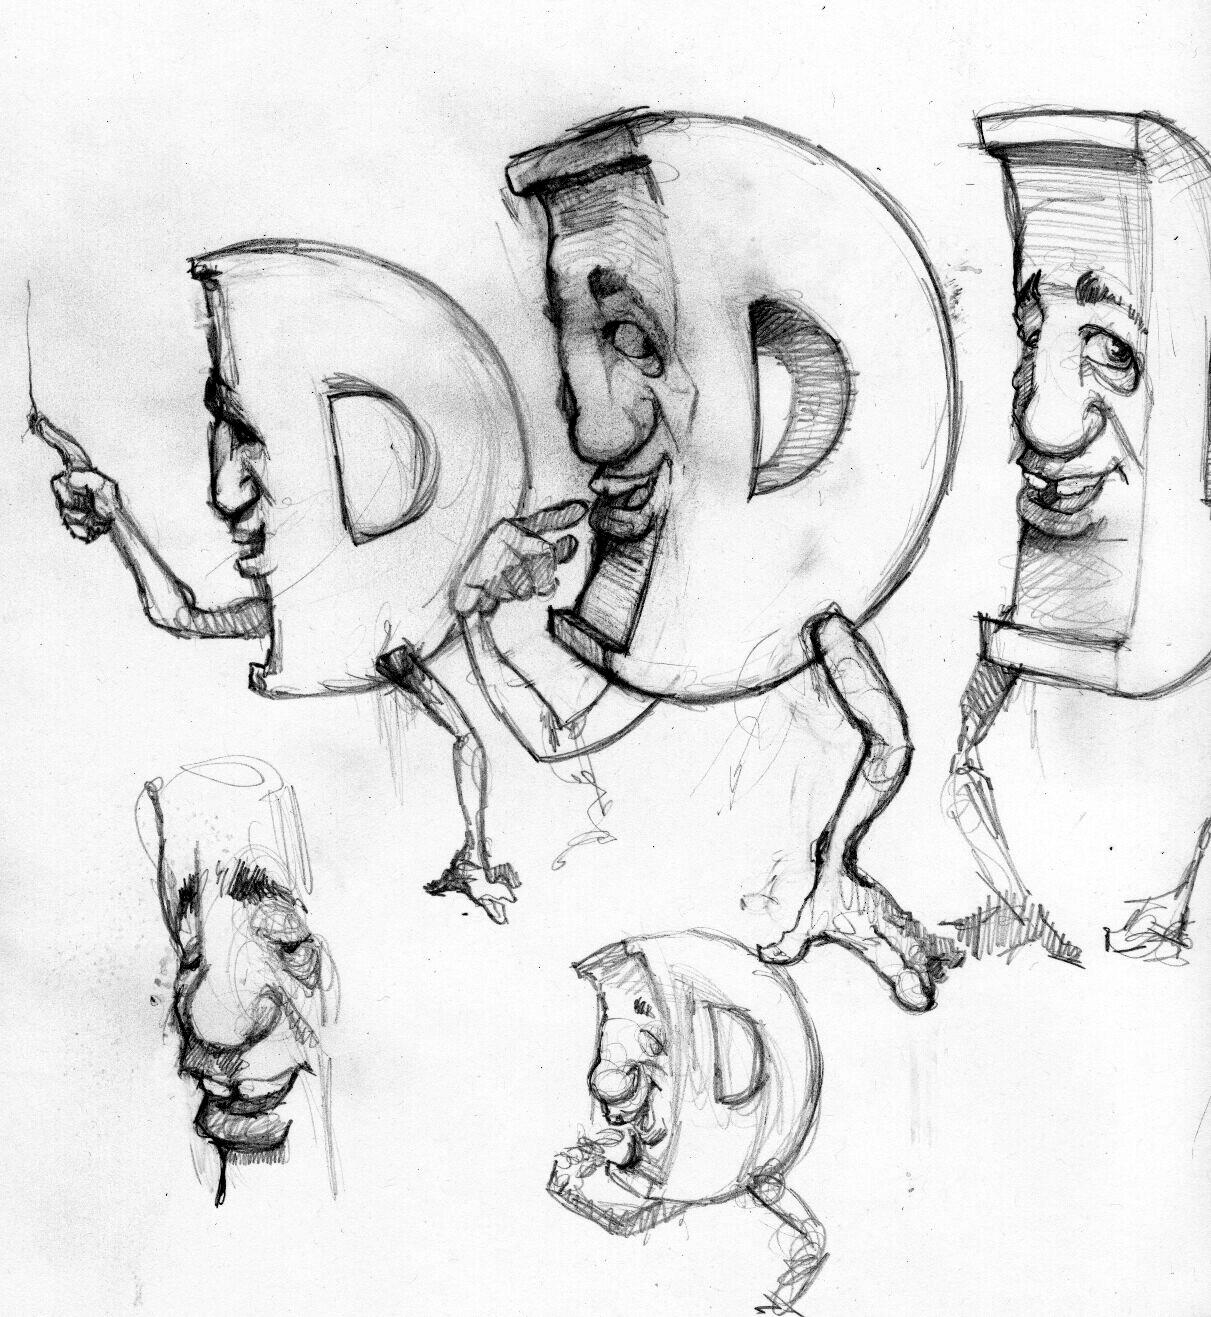 letterD_character